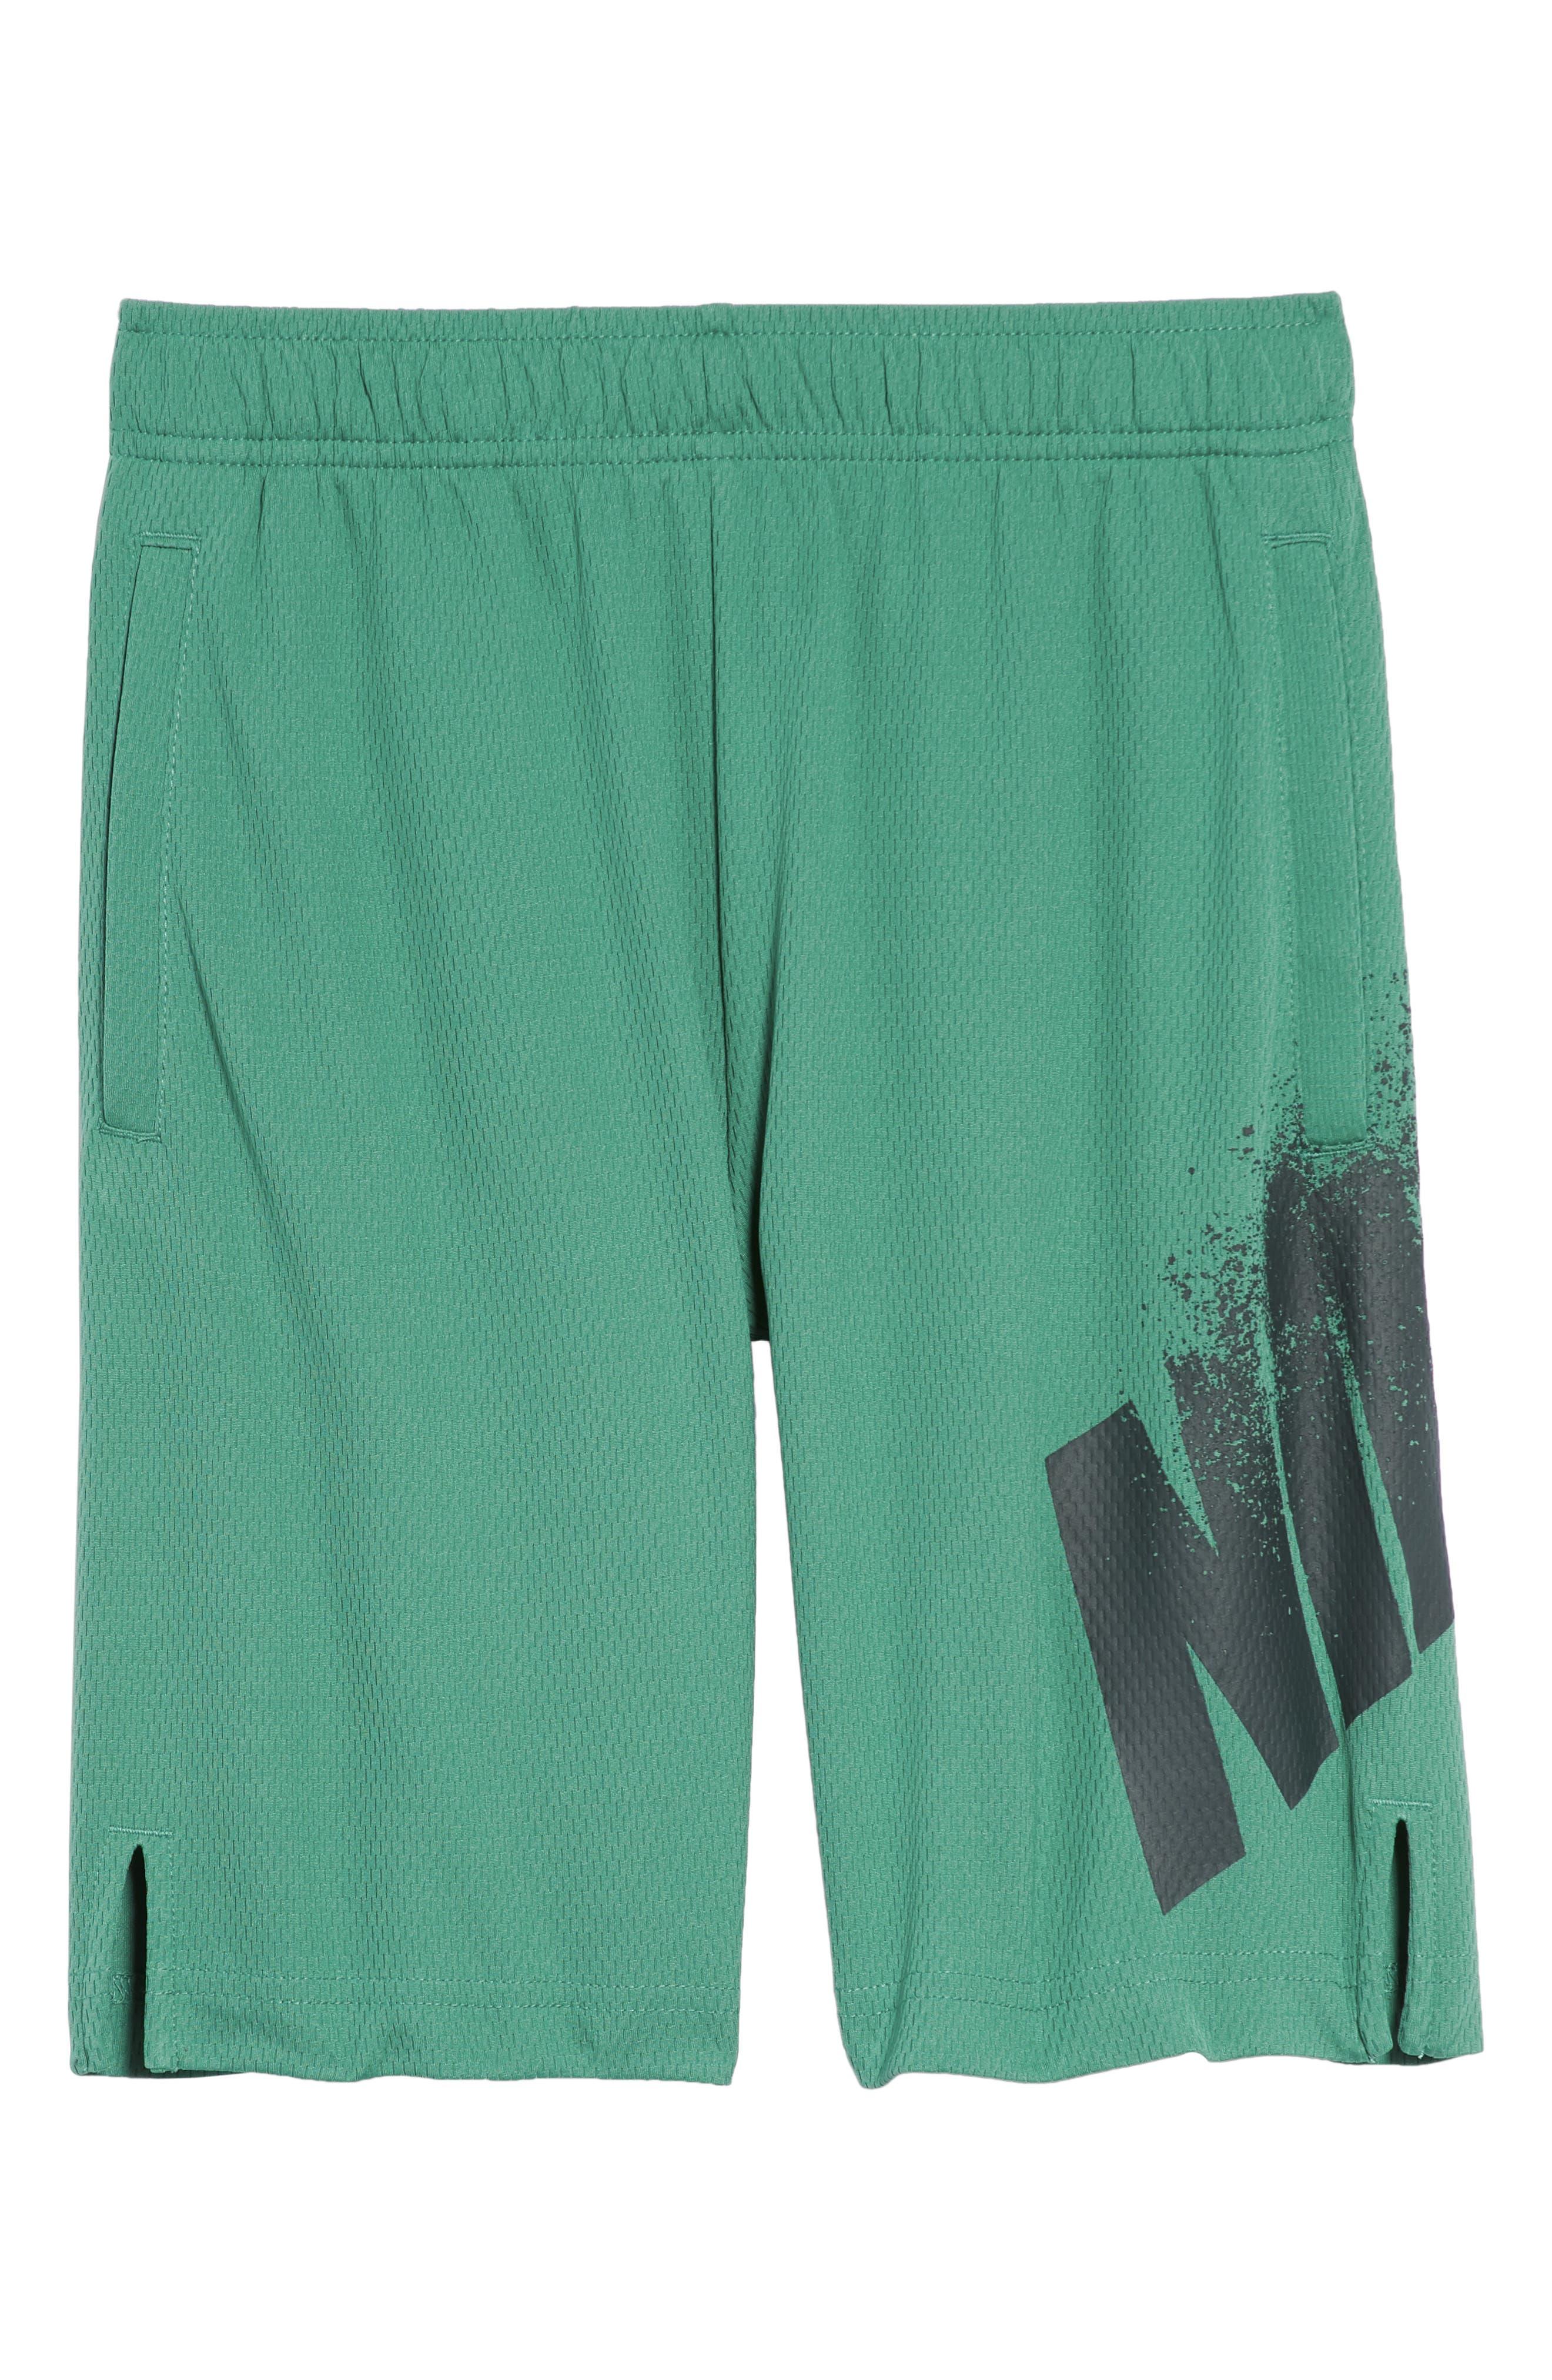 Dry GFX Athletic Shorts,                             Main thumbnail 1, color,                             Green Noise/ Deep Jungle